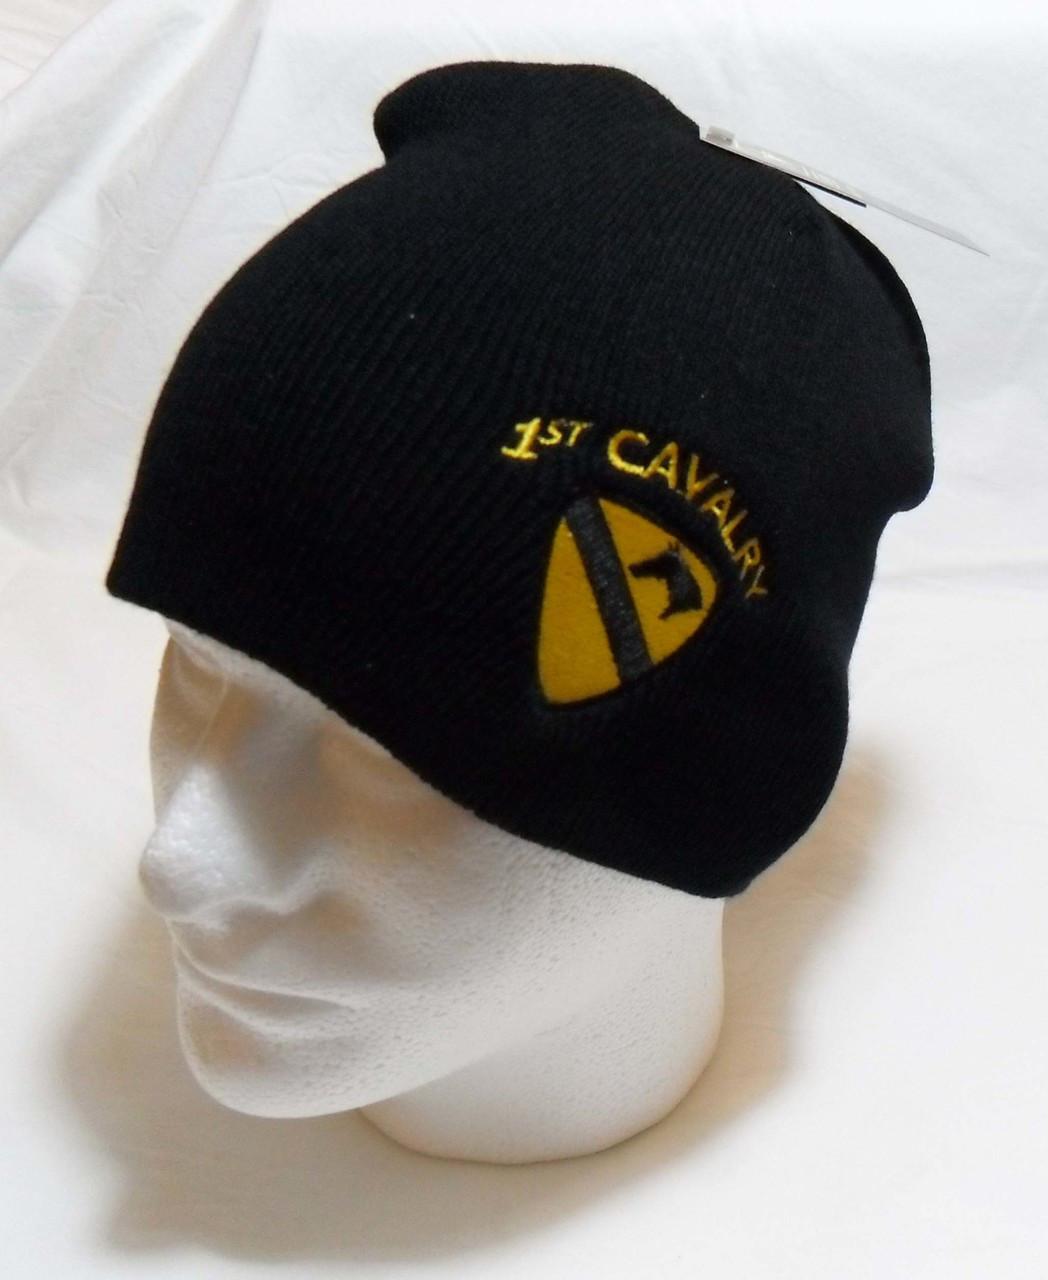 088da156785 US Army 1st Cavalry with Logo Watch Cap Beanie Winter Ski Hat Toboggan  Officially Licensed